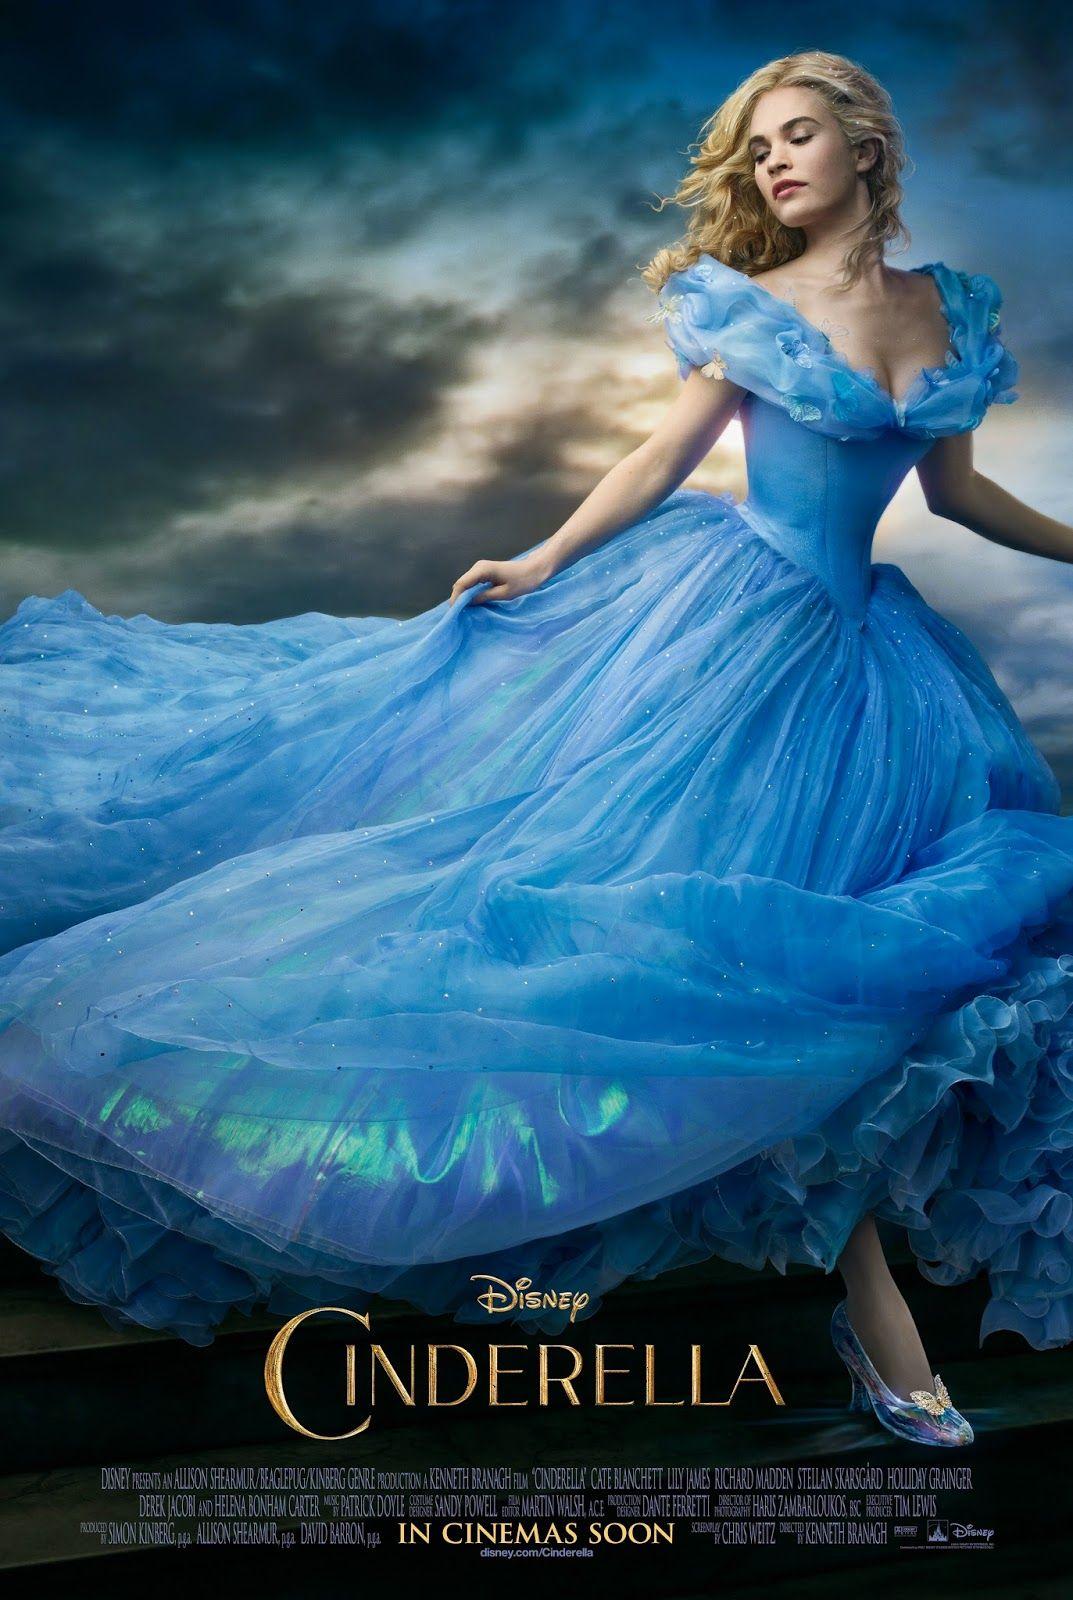 Cinderella (2015) - Christian And Sociable Movies